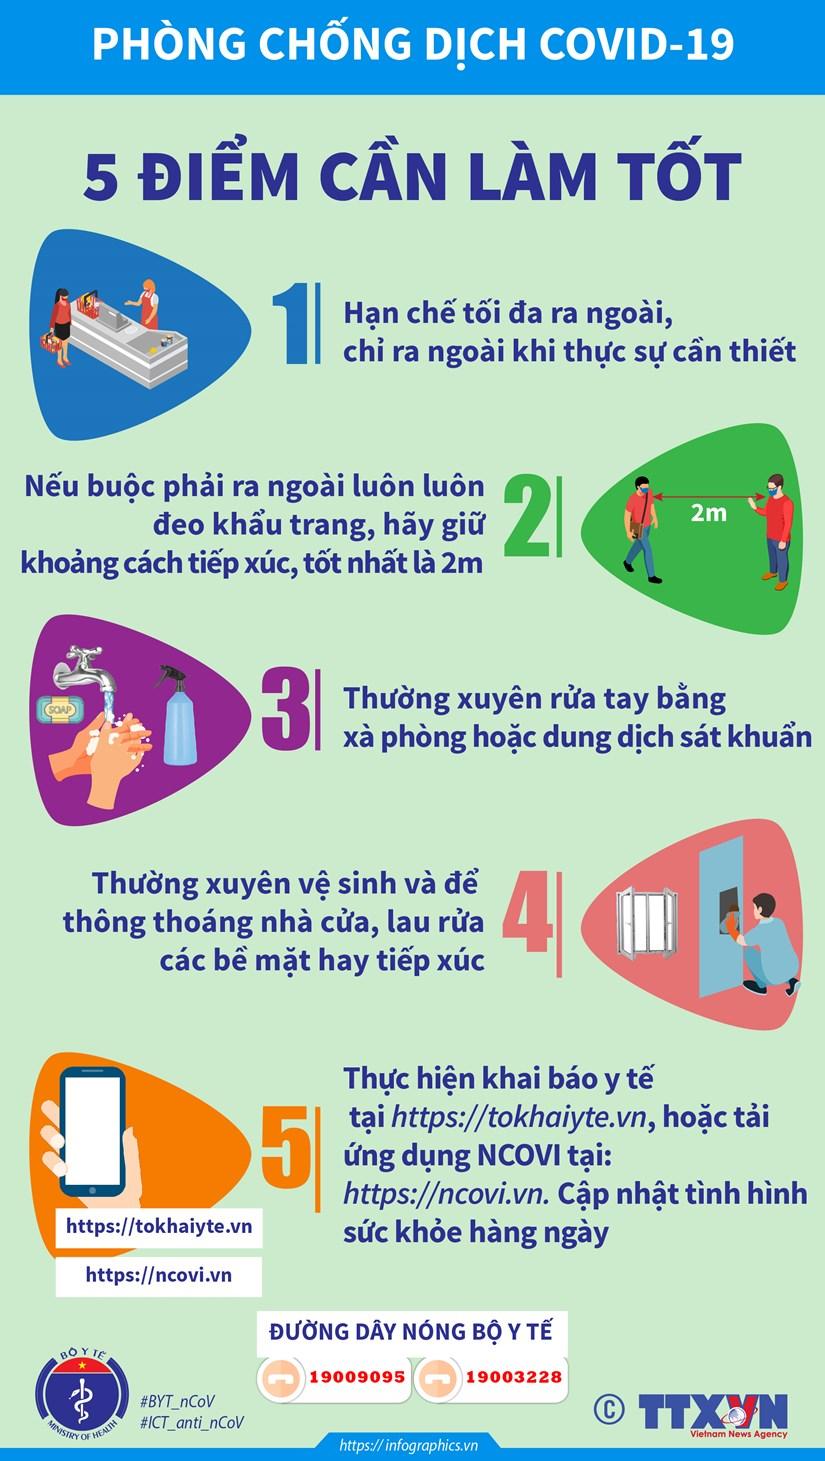 [Infographics] 5 diem can lam tot de phong, chong dich COVID-19 hinh anh 1